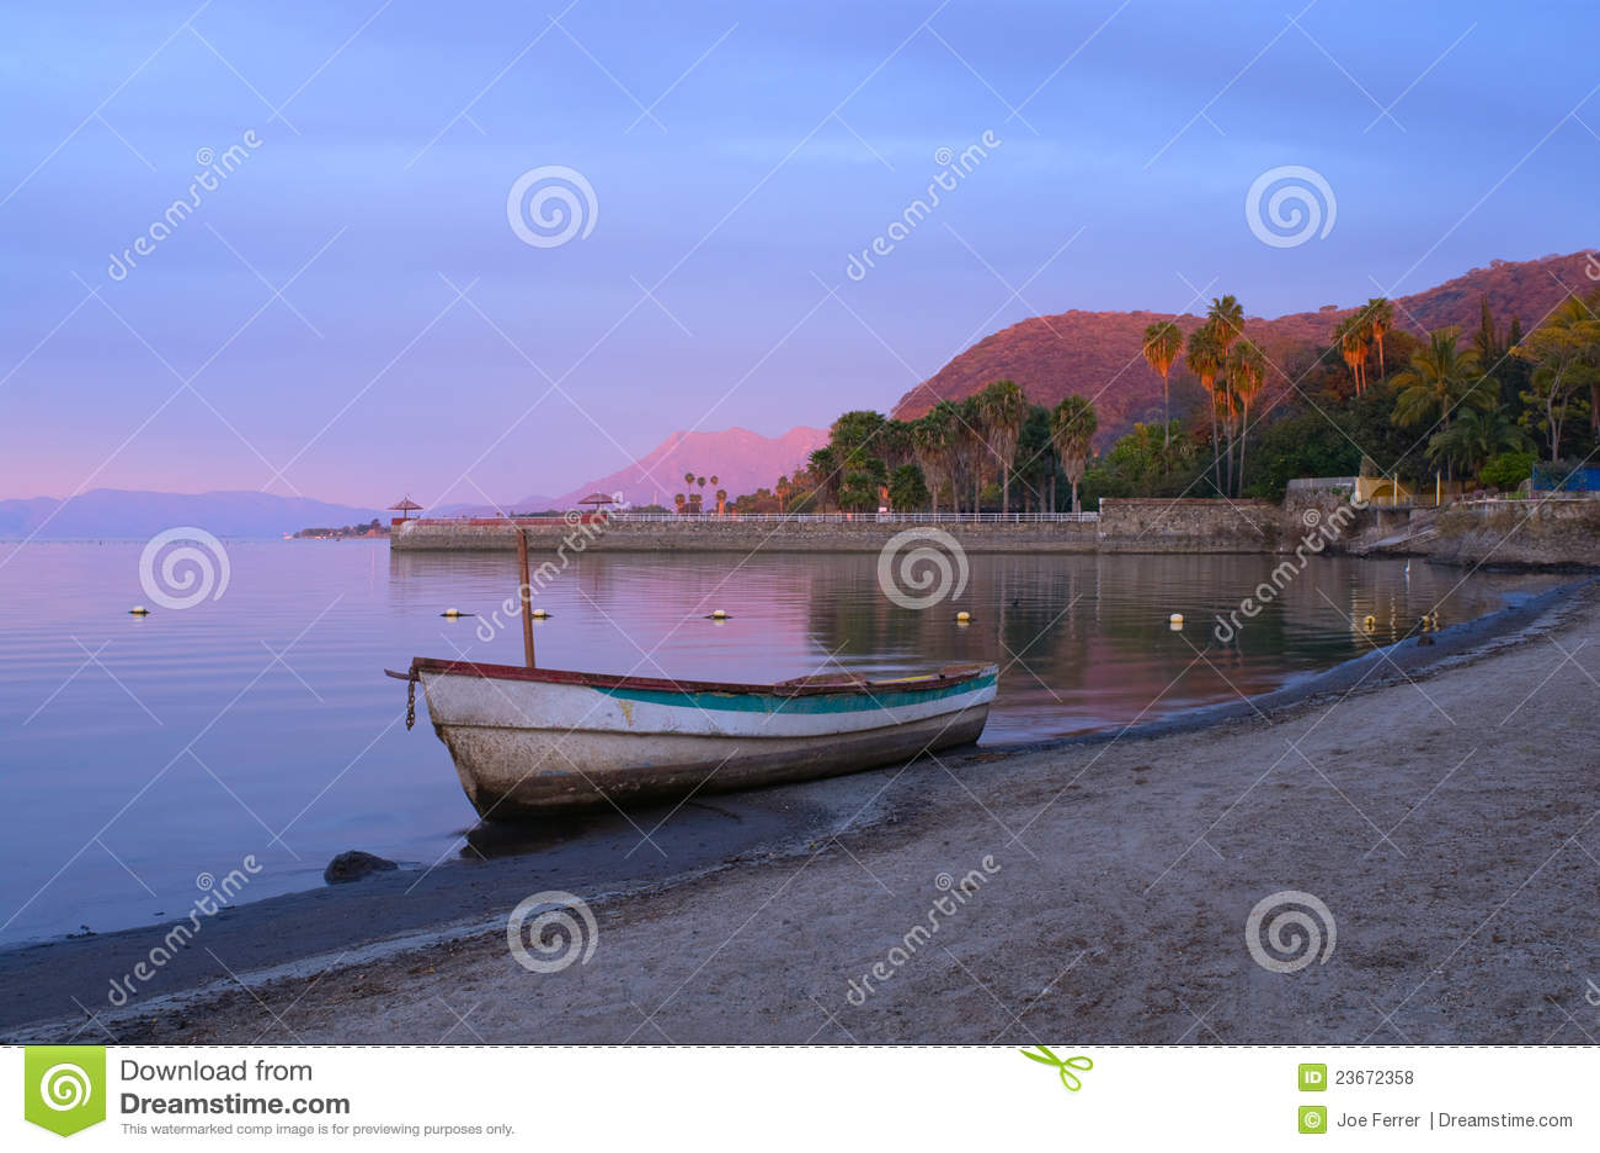 Daybreak on Lake Chapala Shores